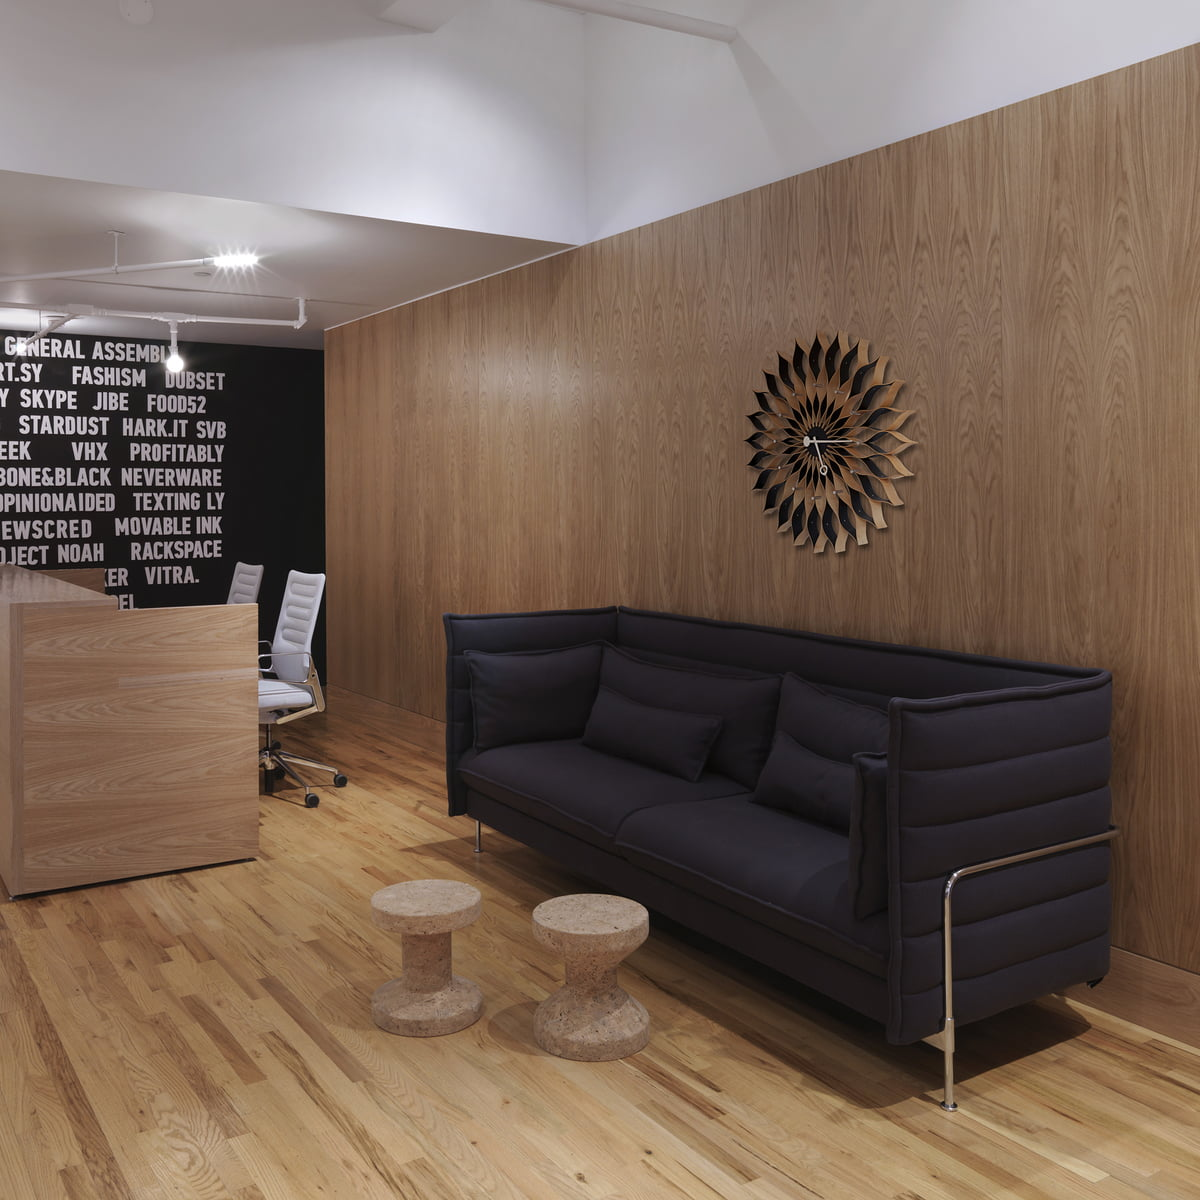 Vitra   Stool   Cork Family   Alcove Plume Sofa